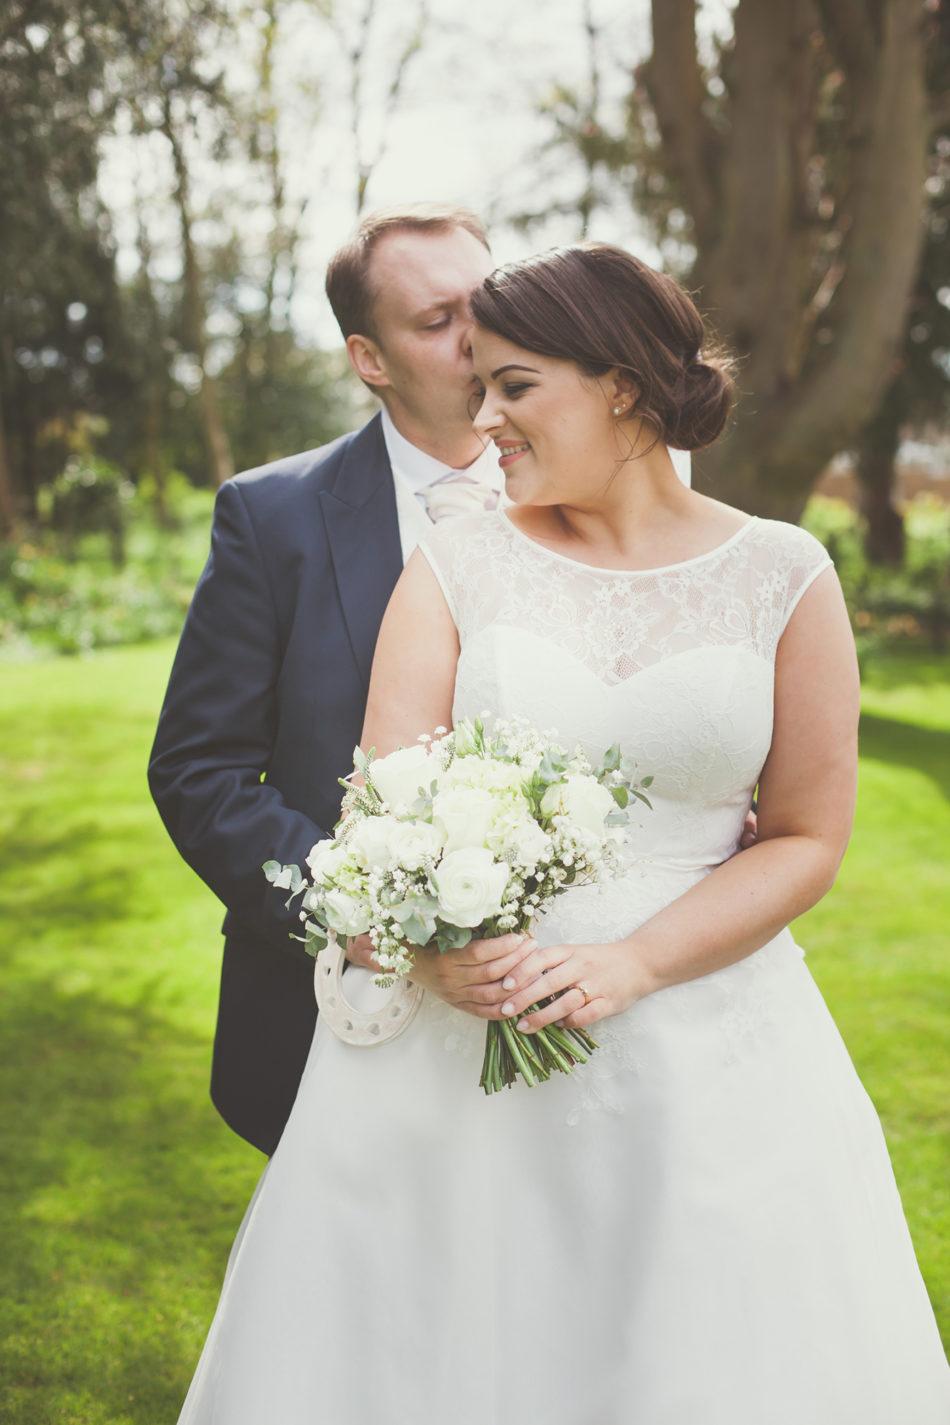 Amy Dyche Wedding Flower Testimonial